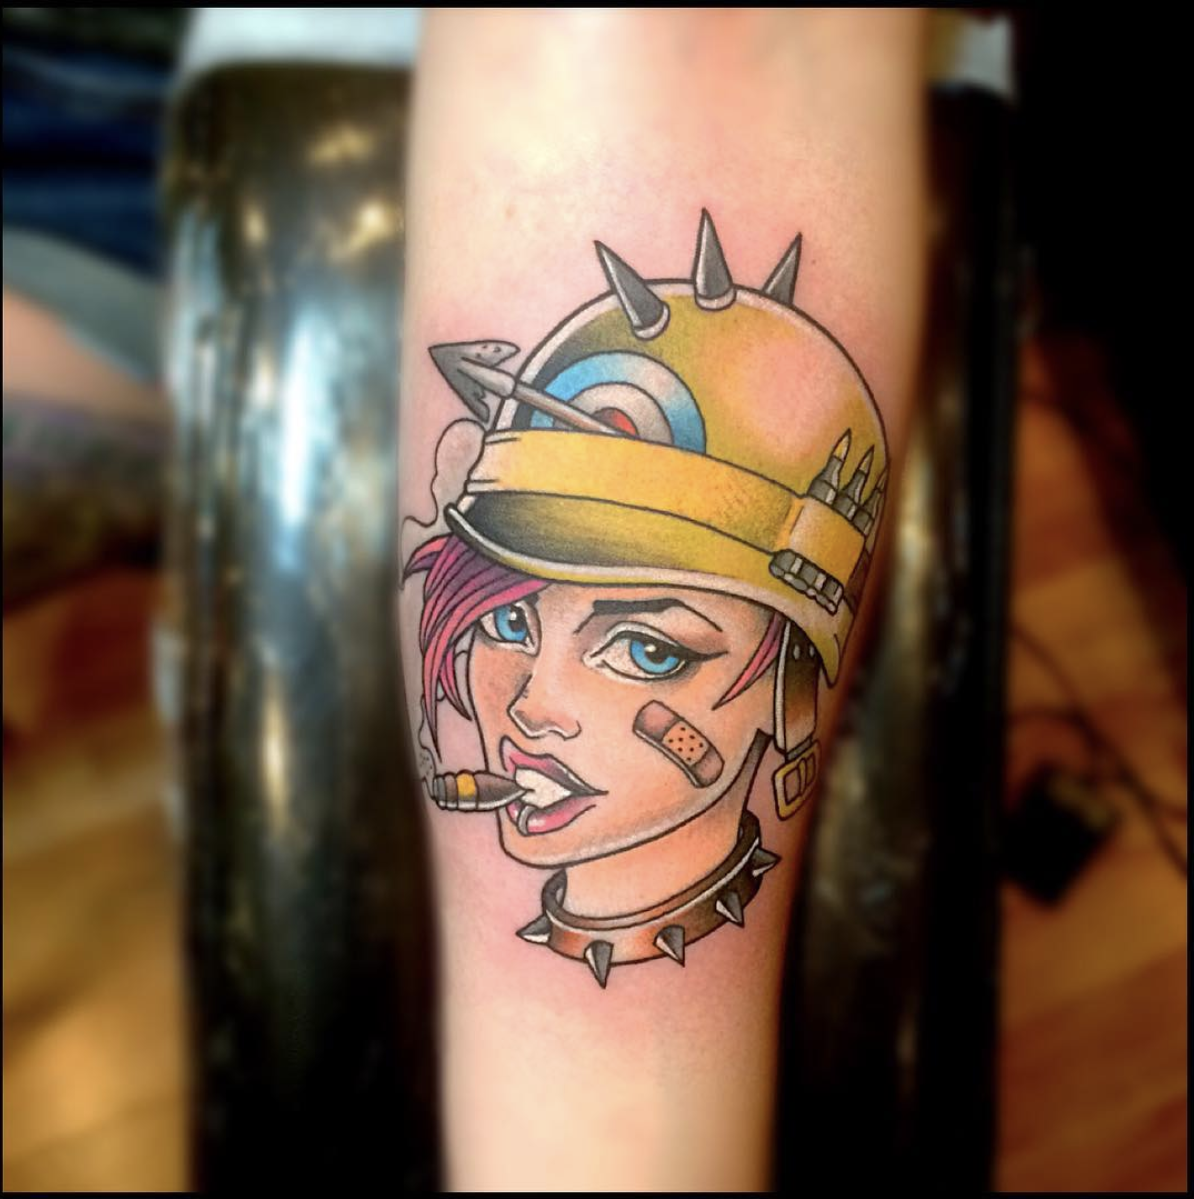 tattoo-tank-girl.png